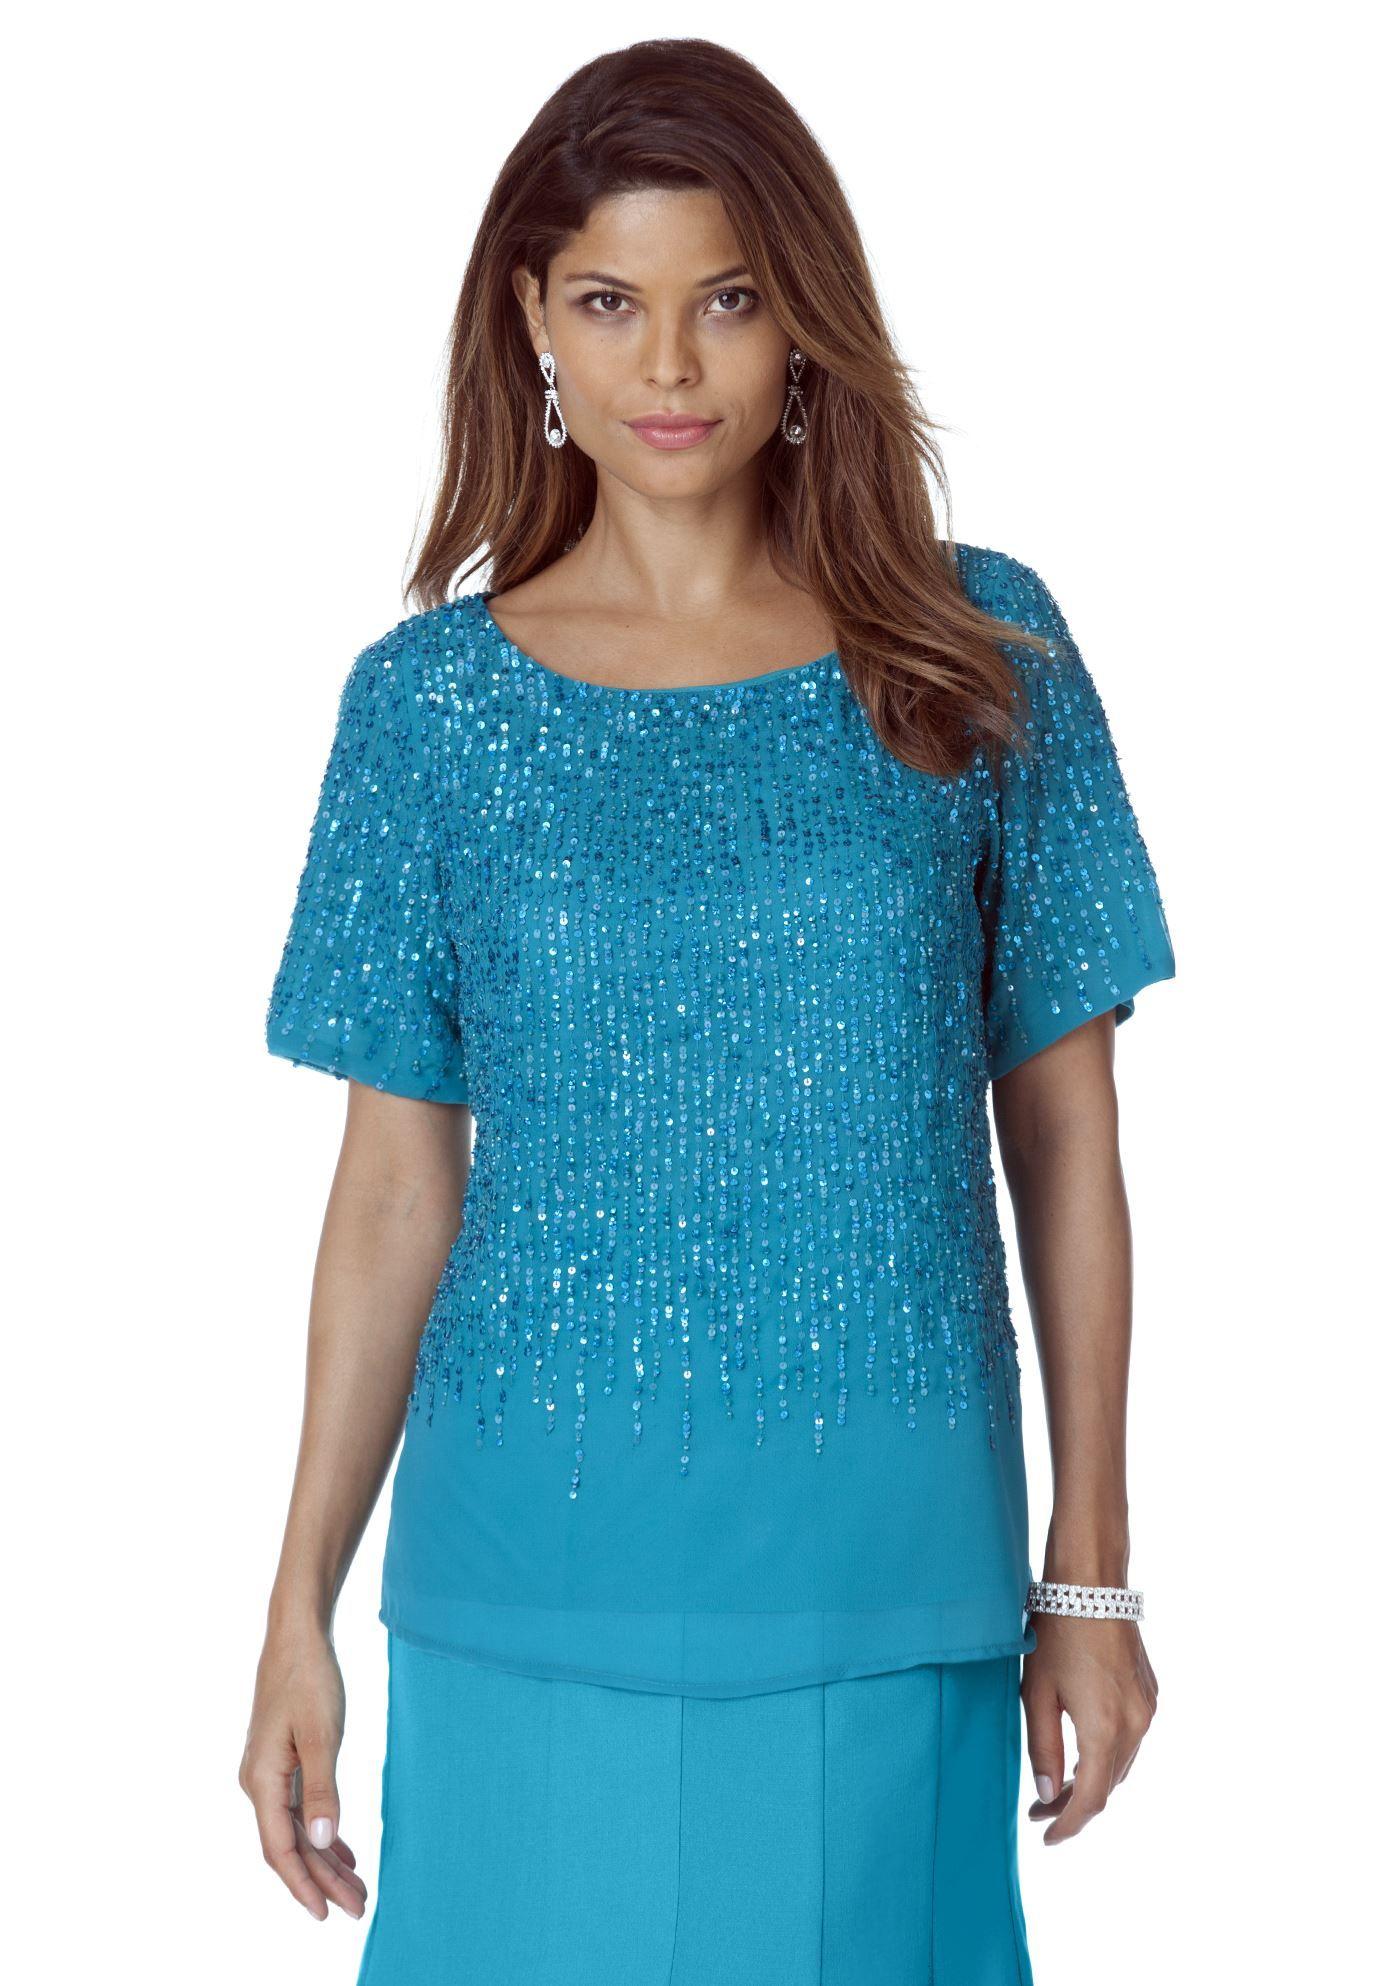 Plus Size Roaman\'s® Scattered Sequin Top | wedding dresses ...